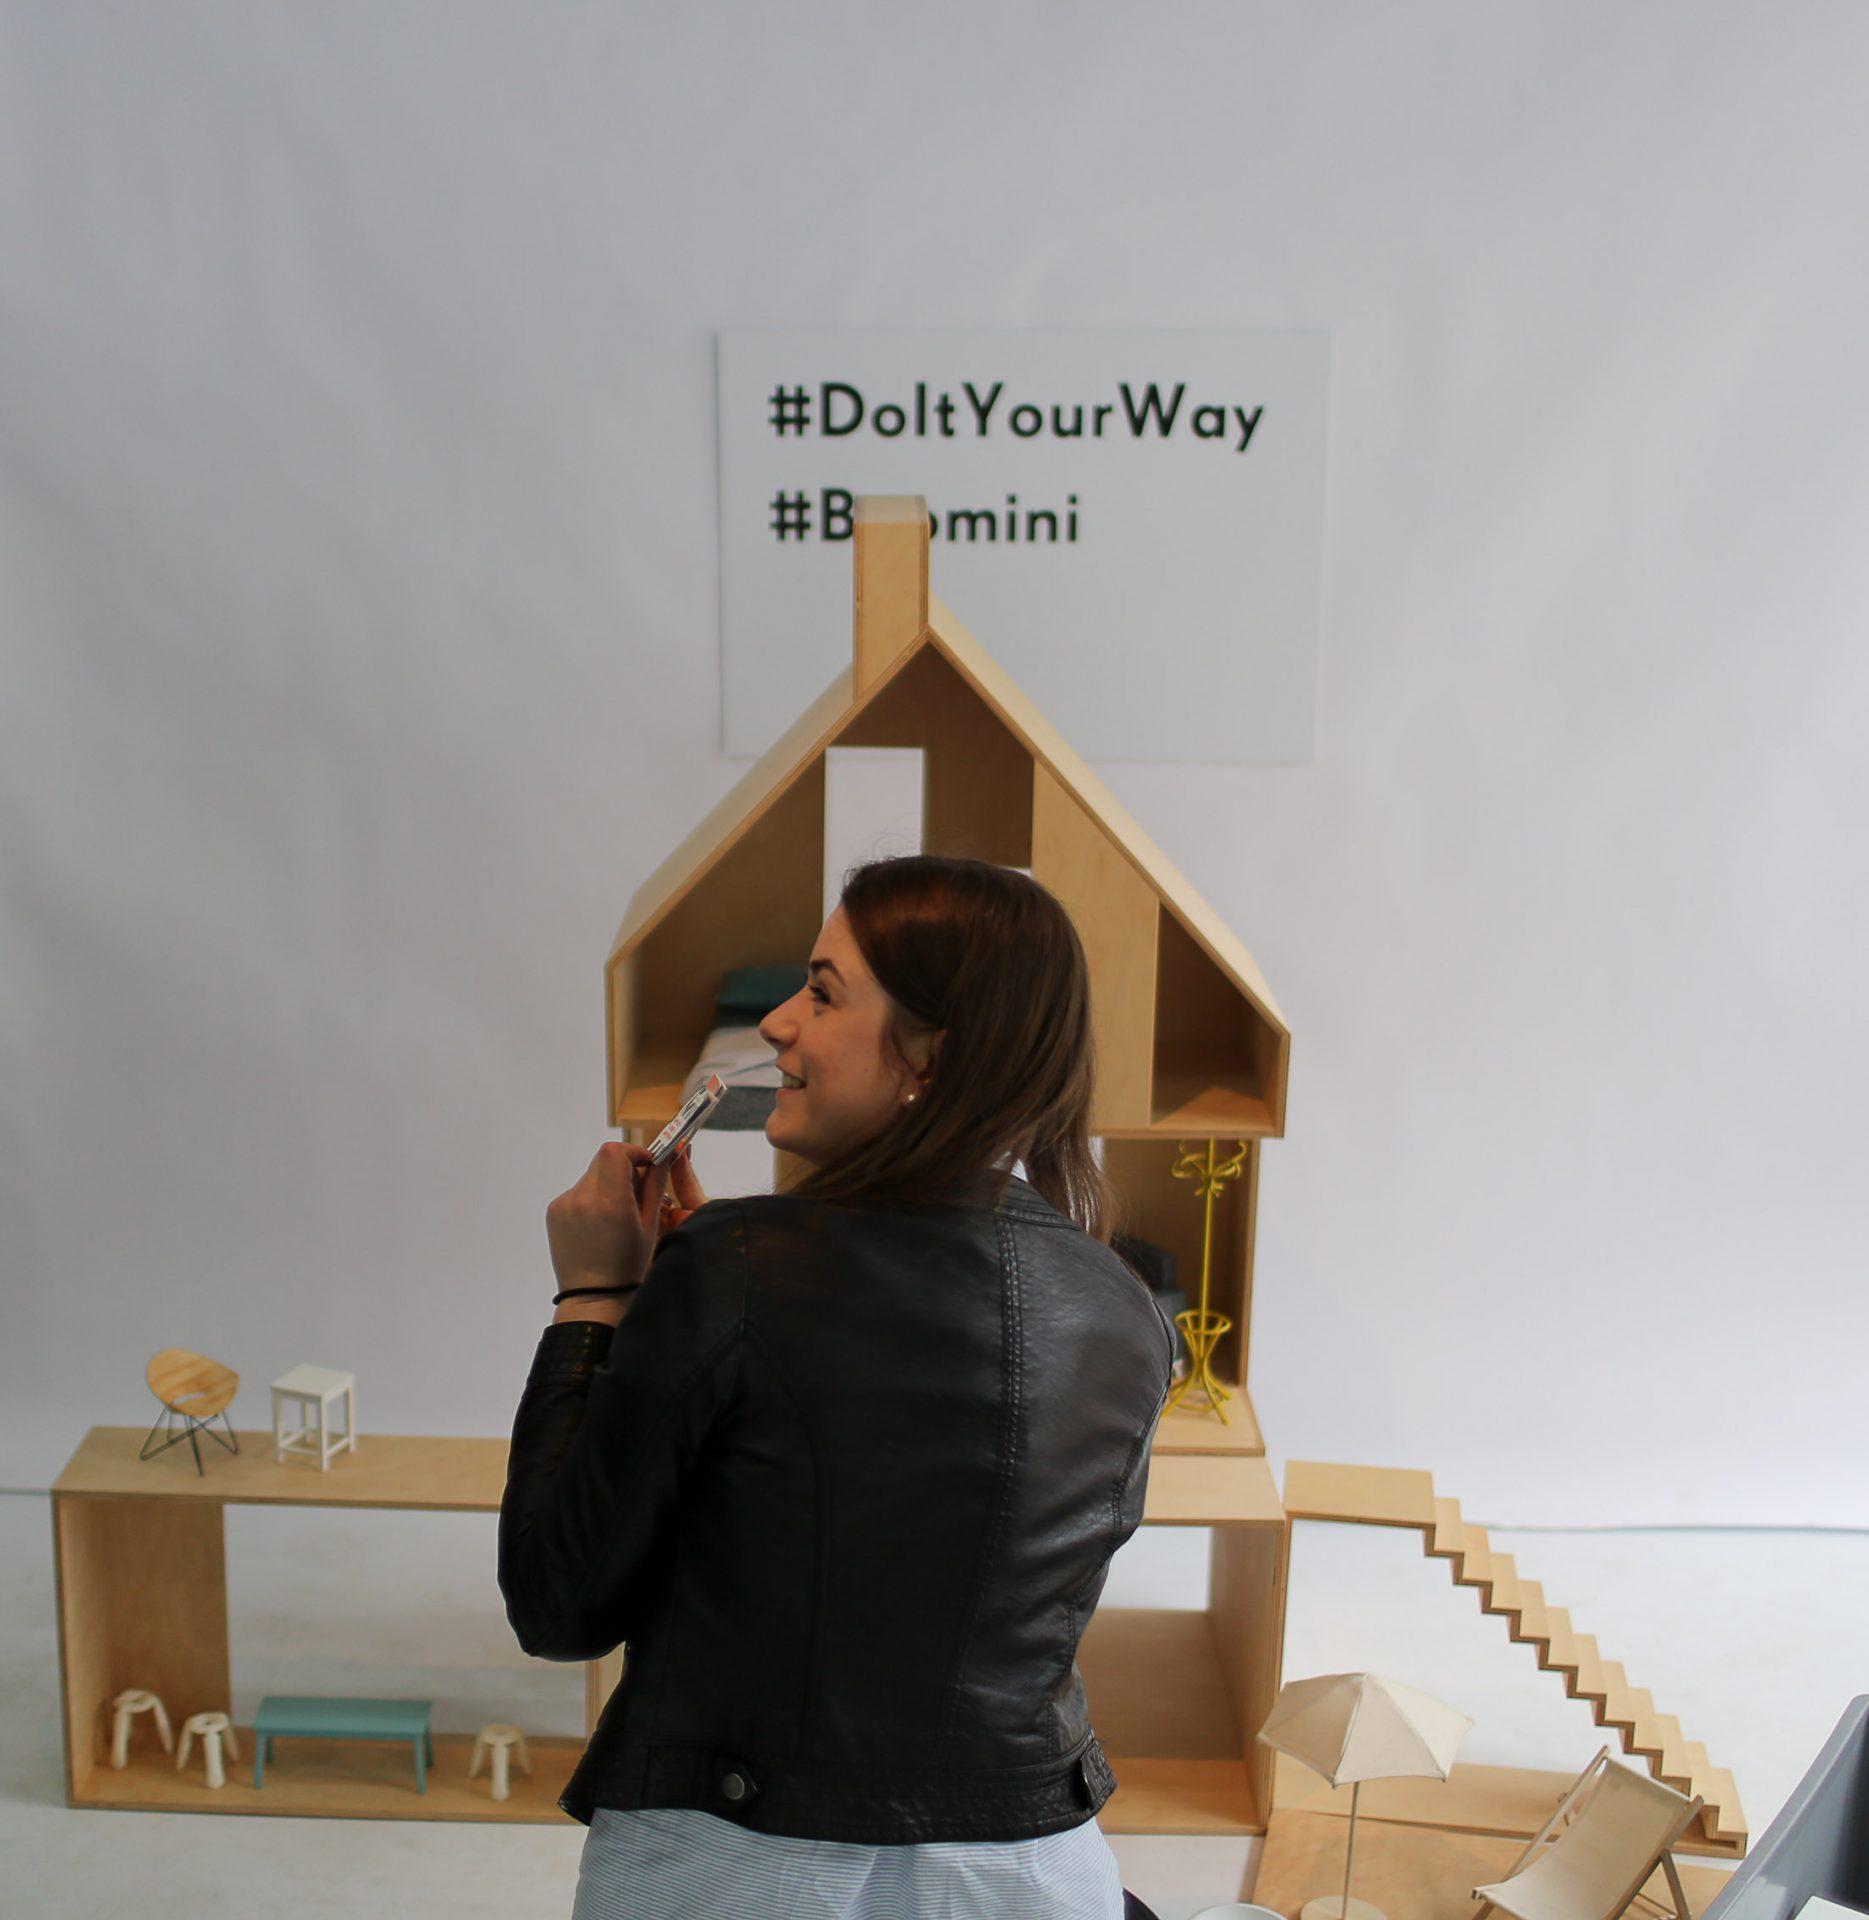 do_-it_your_way_designalive-jpg-22